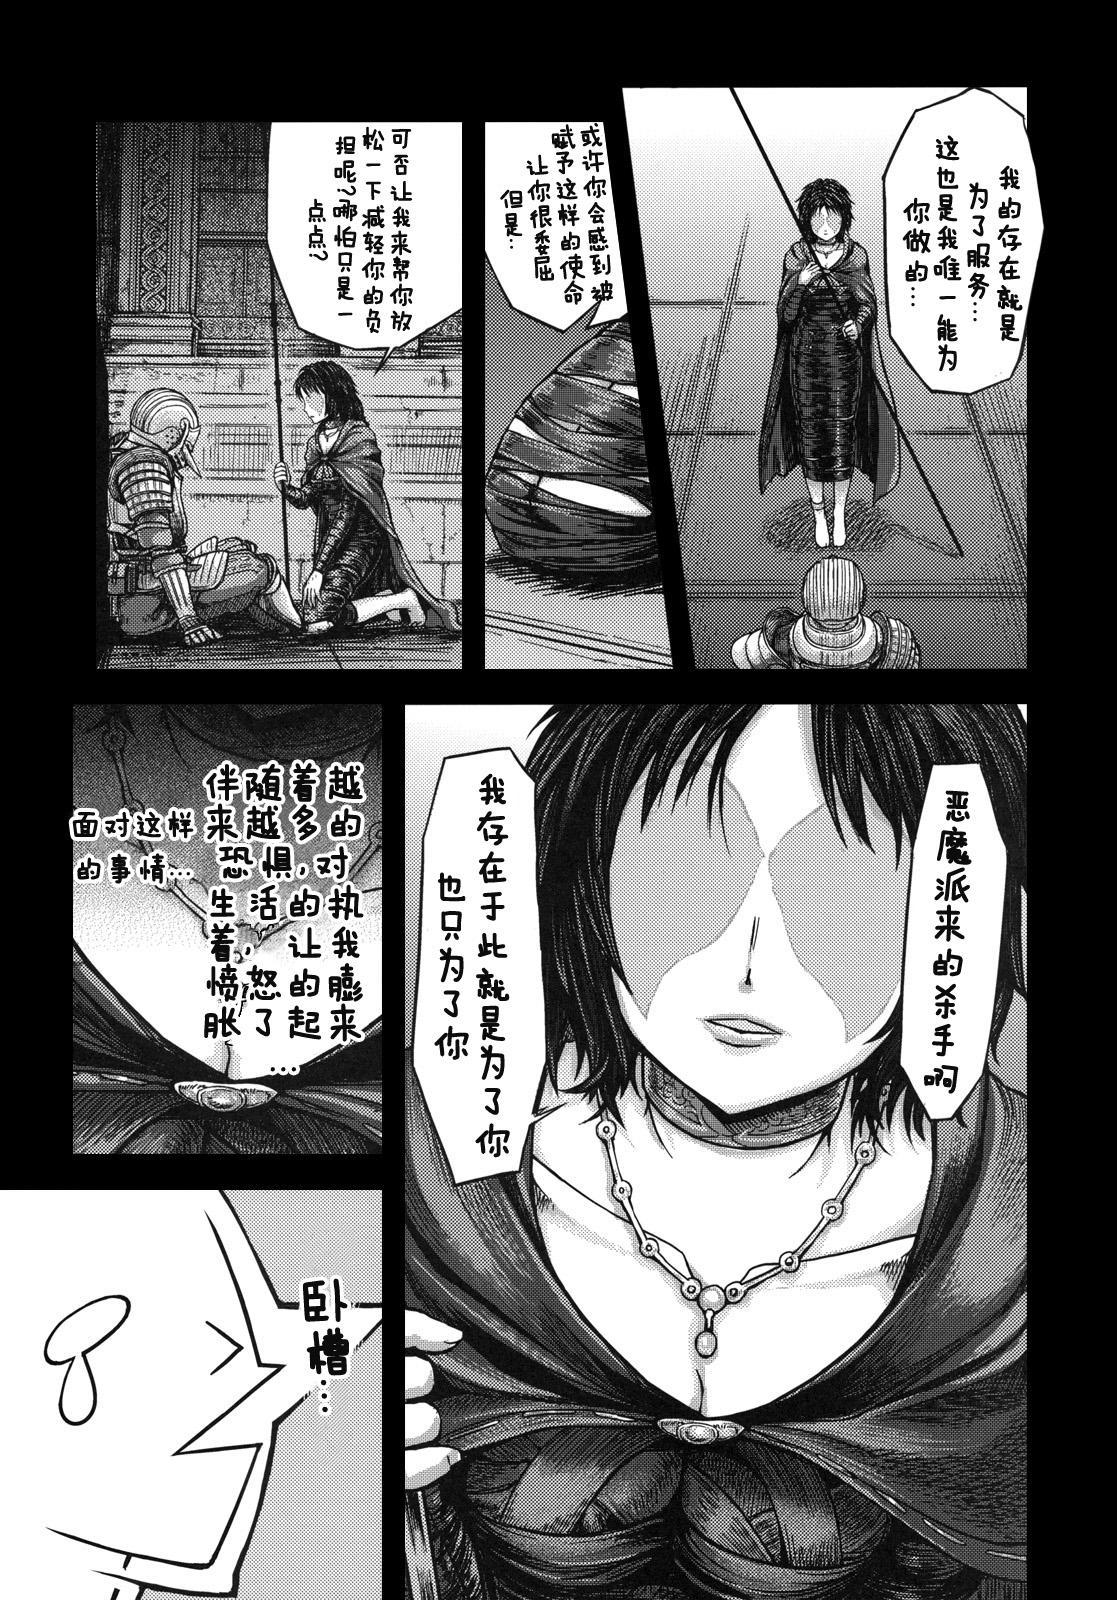 Kono Saki, Ashi ni Chuuishiro | Be Wary of Feet Ahead 7